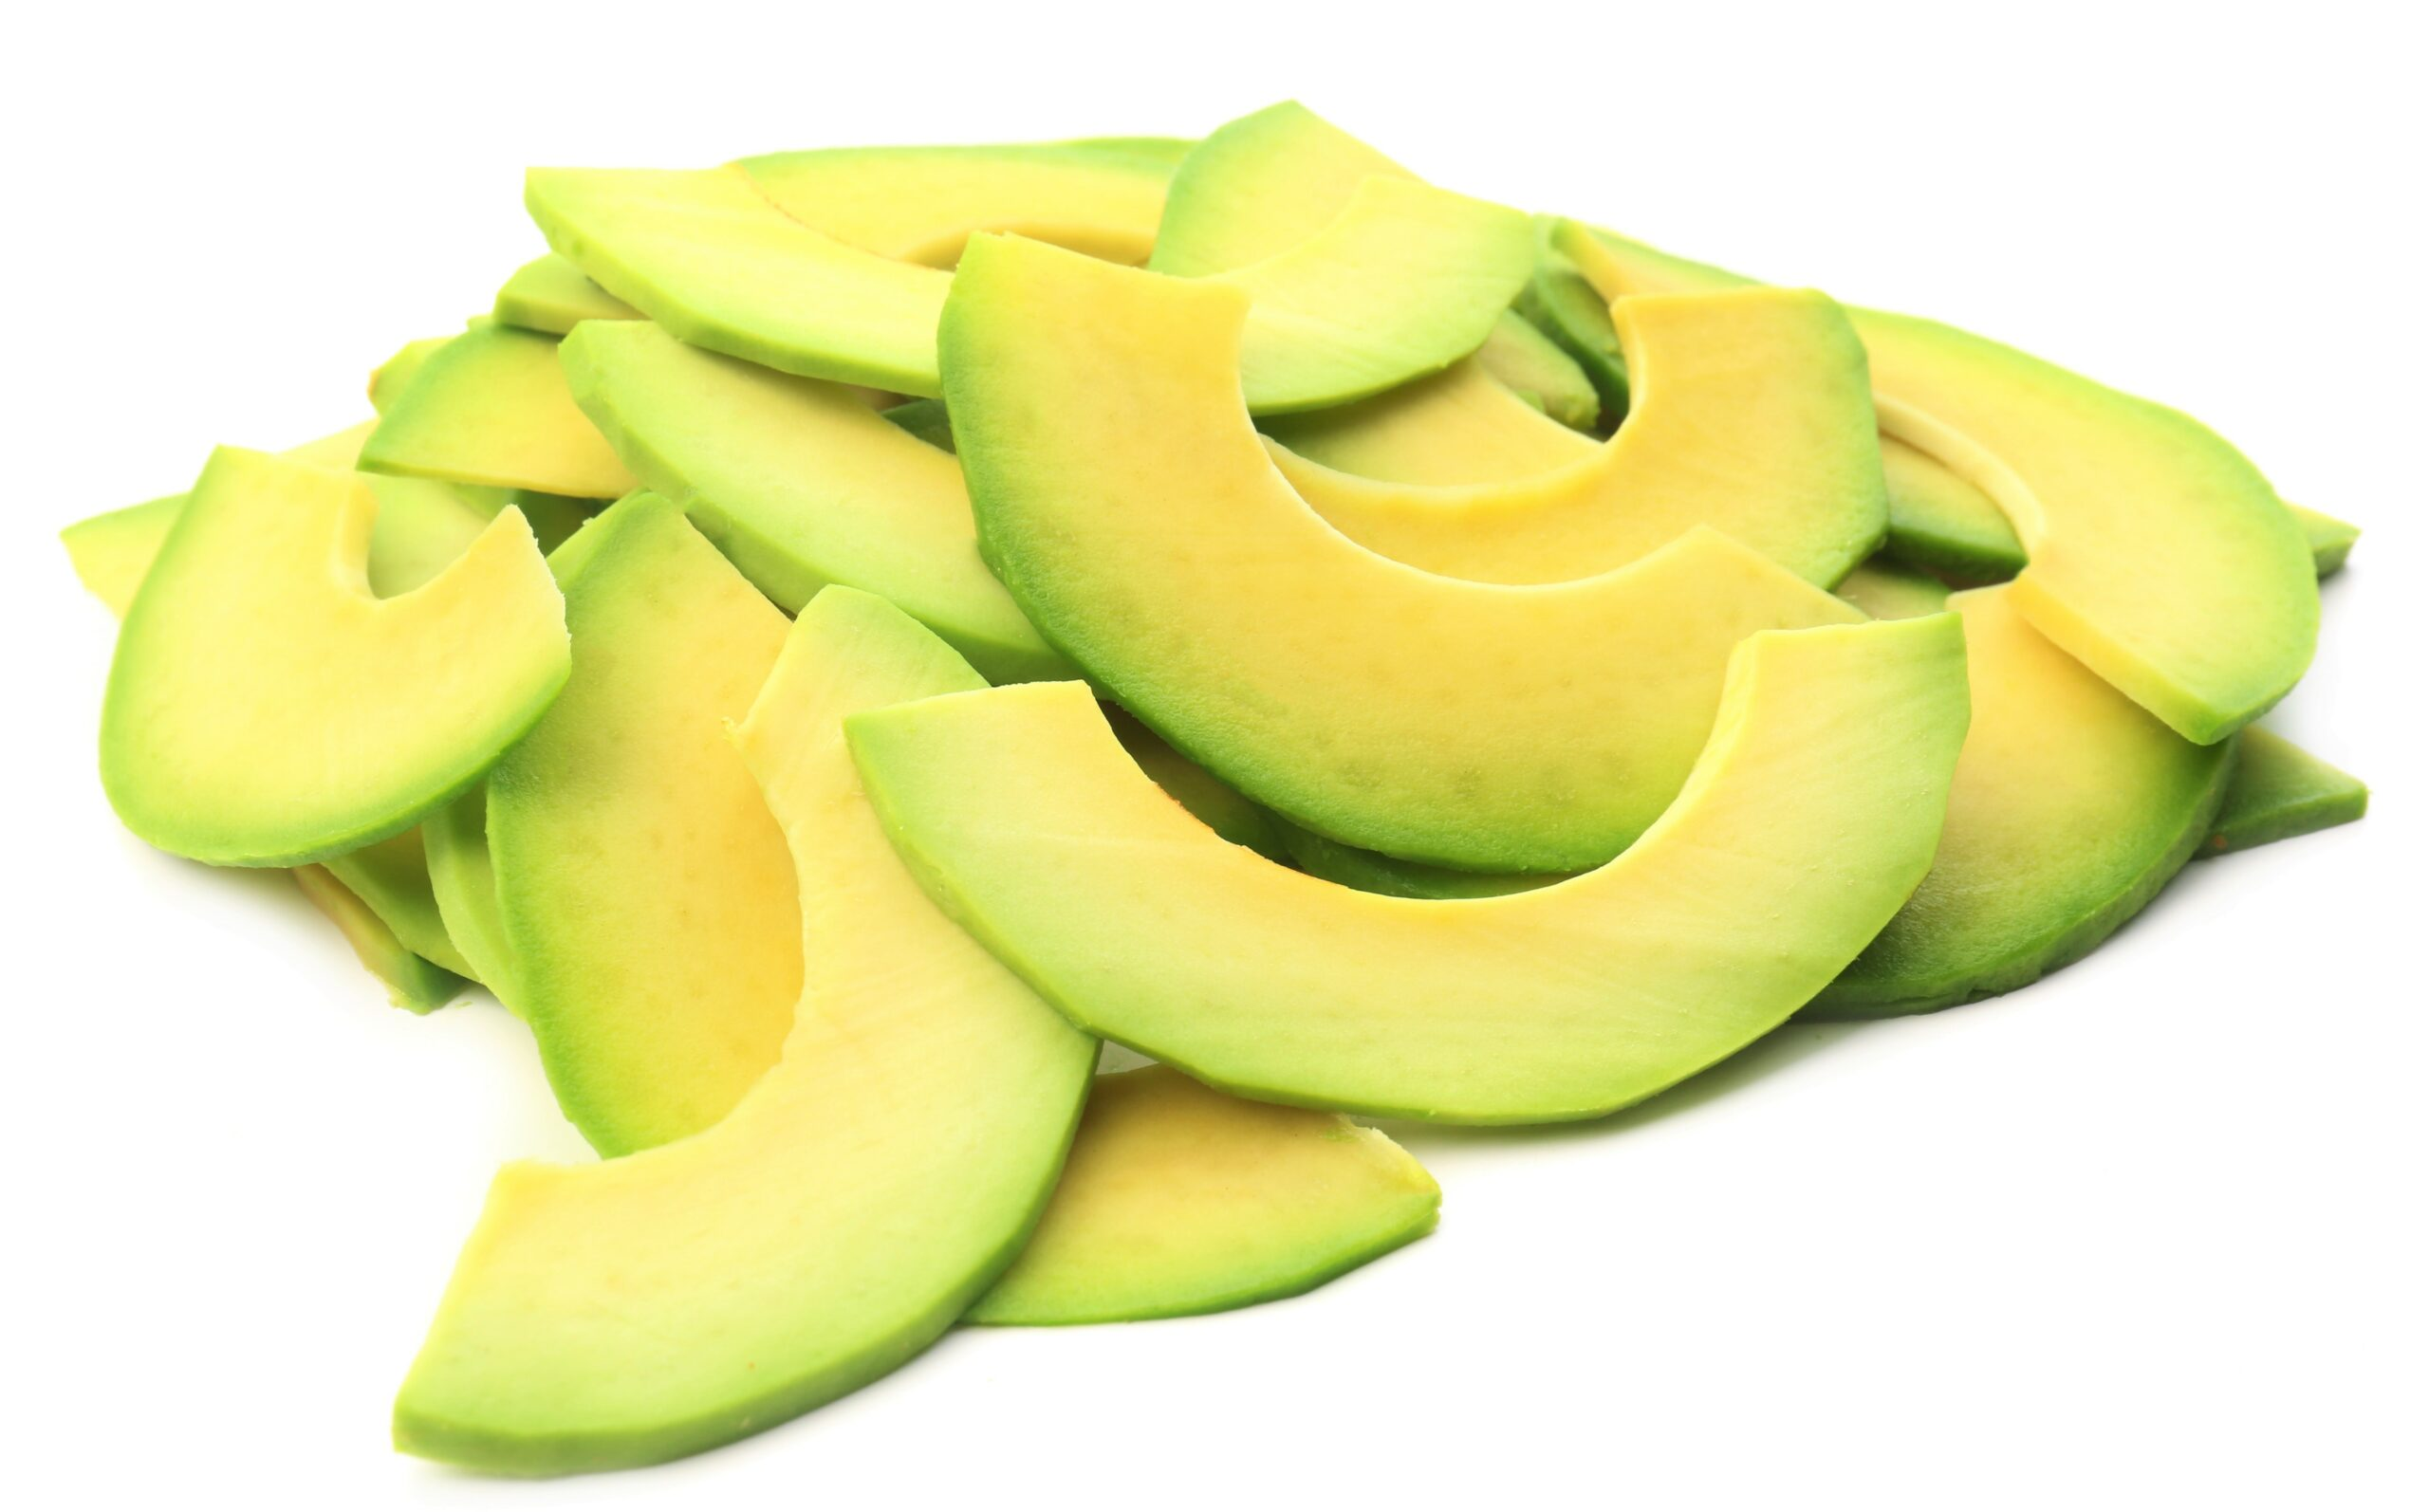 Avocadoscheiben Image